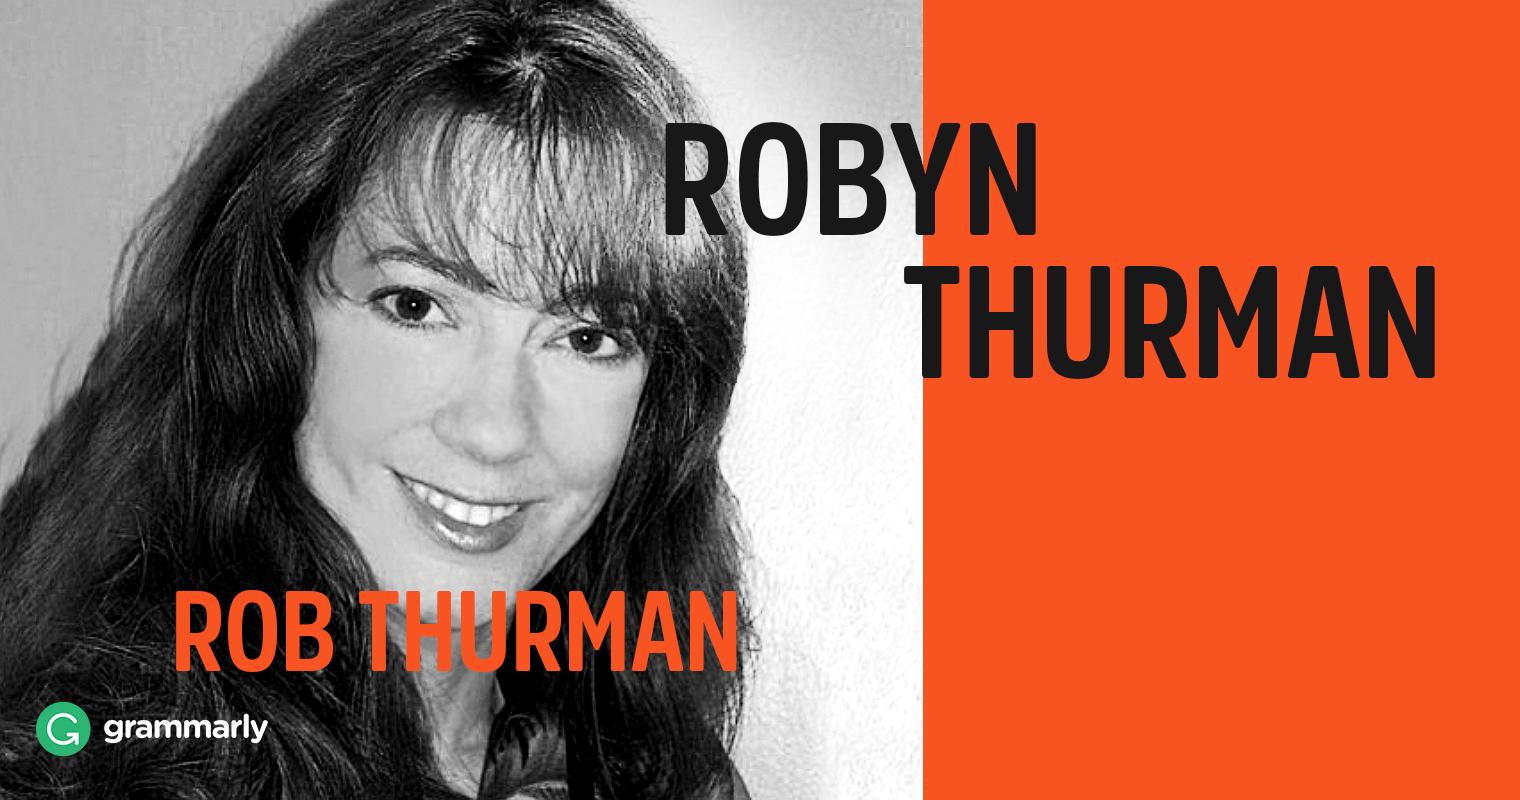 Robyn Thurman and Rob Thurman